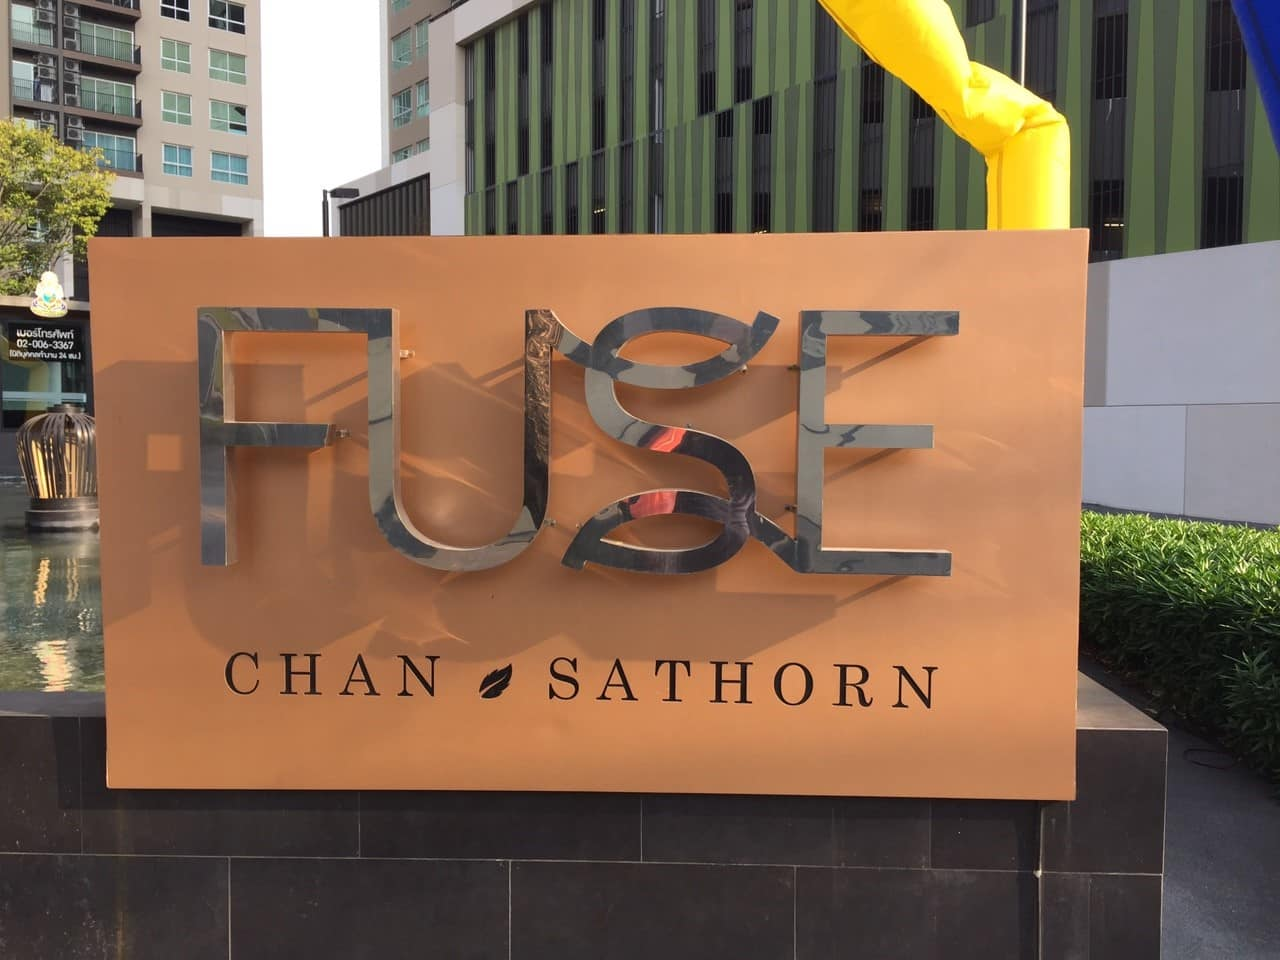 Fuse Chan - Sathorn